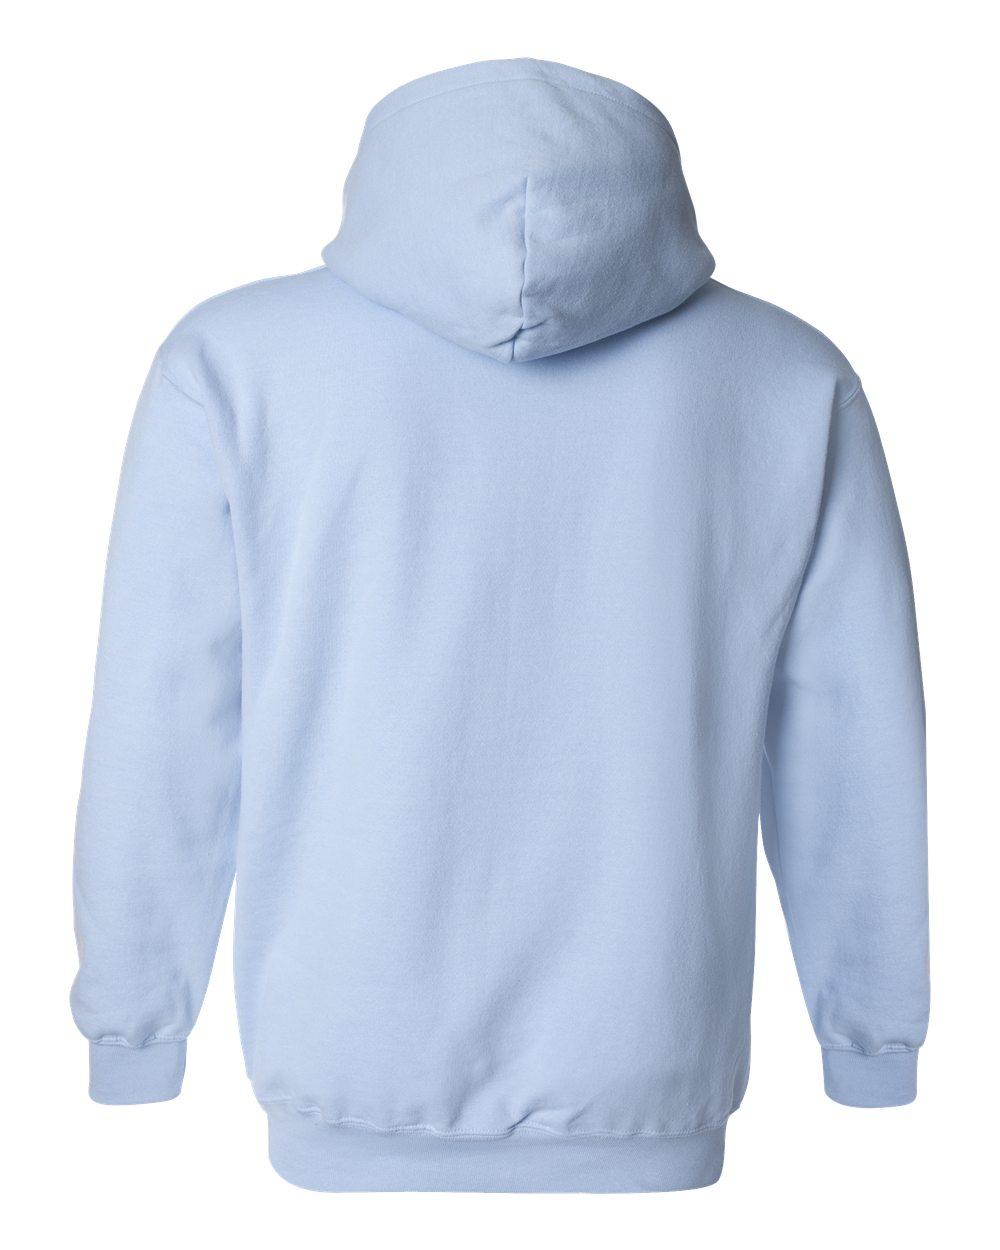 Gildan-Mens-Blank-Hoodie-Heavy-Blend-Hooded-Sweatshirt-Solid-18500-up-to-5XL thumbnail 51